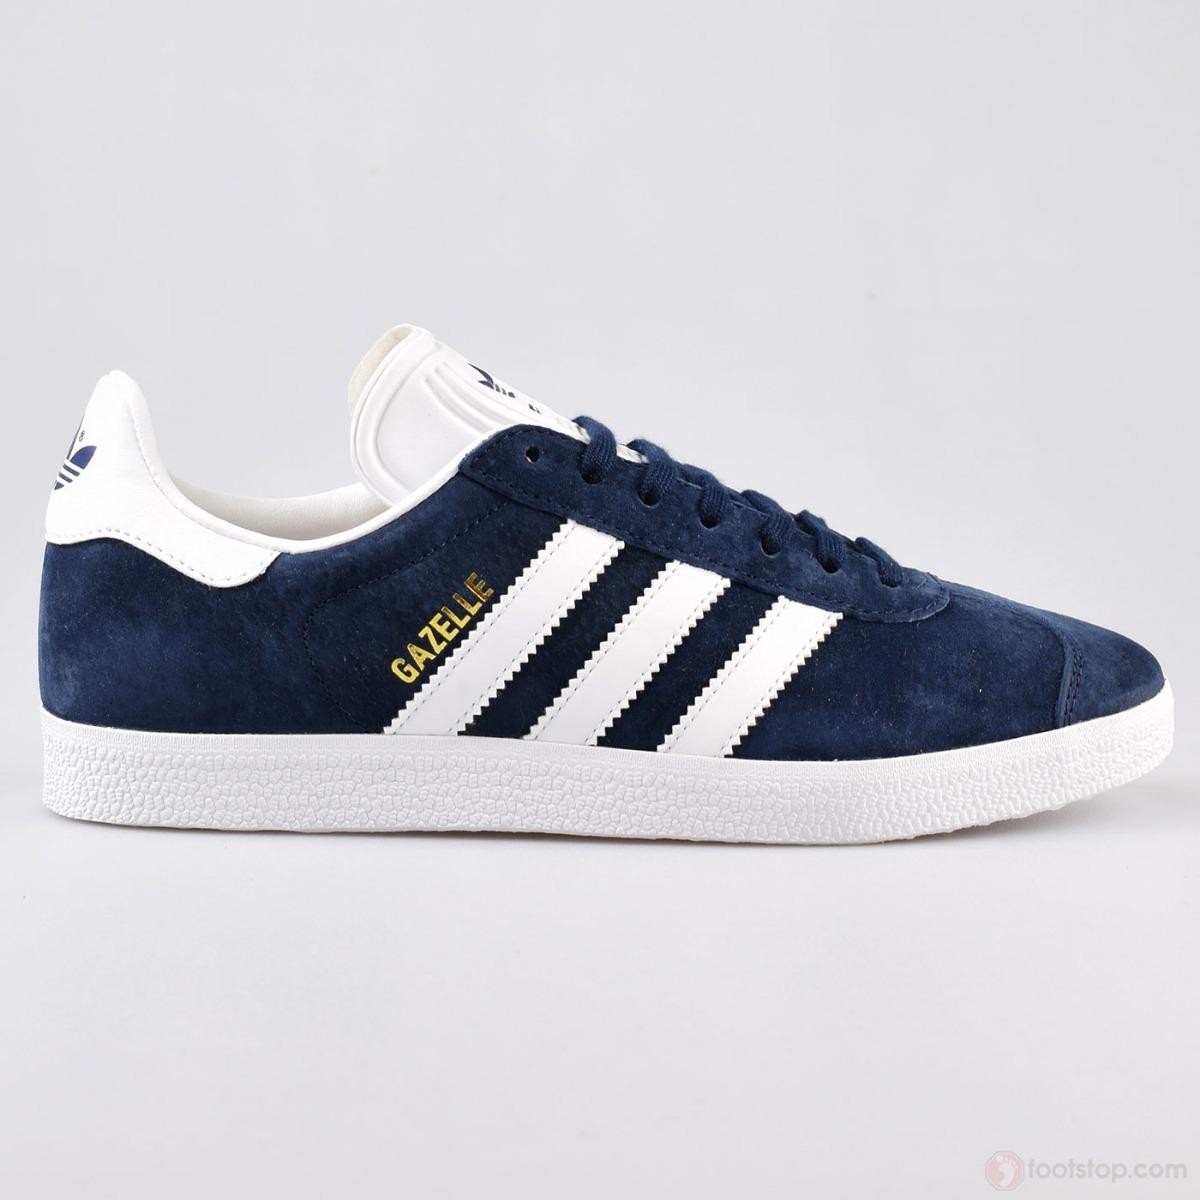 25c5b196d76 Tenis adidas Gazelle Azules Con Blanco Hombre